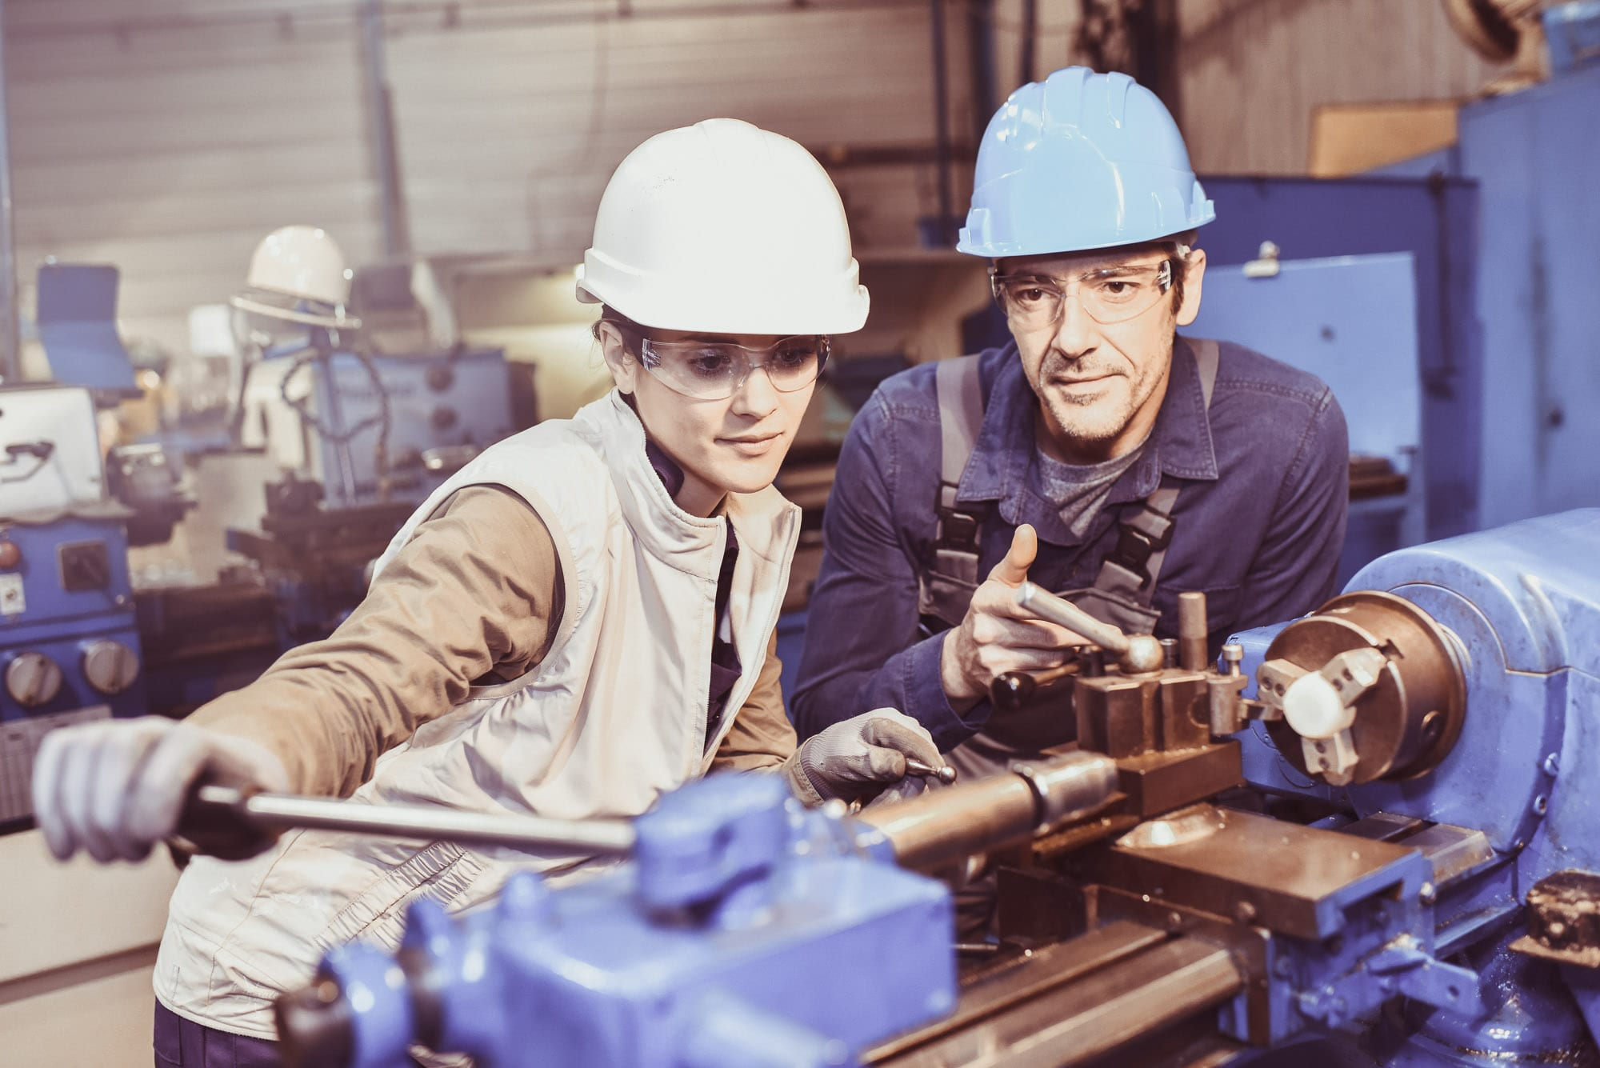 Work experience engineer trainee